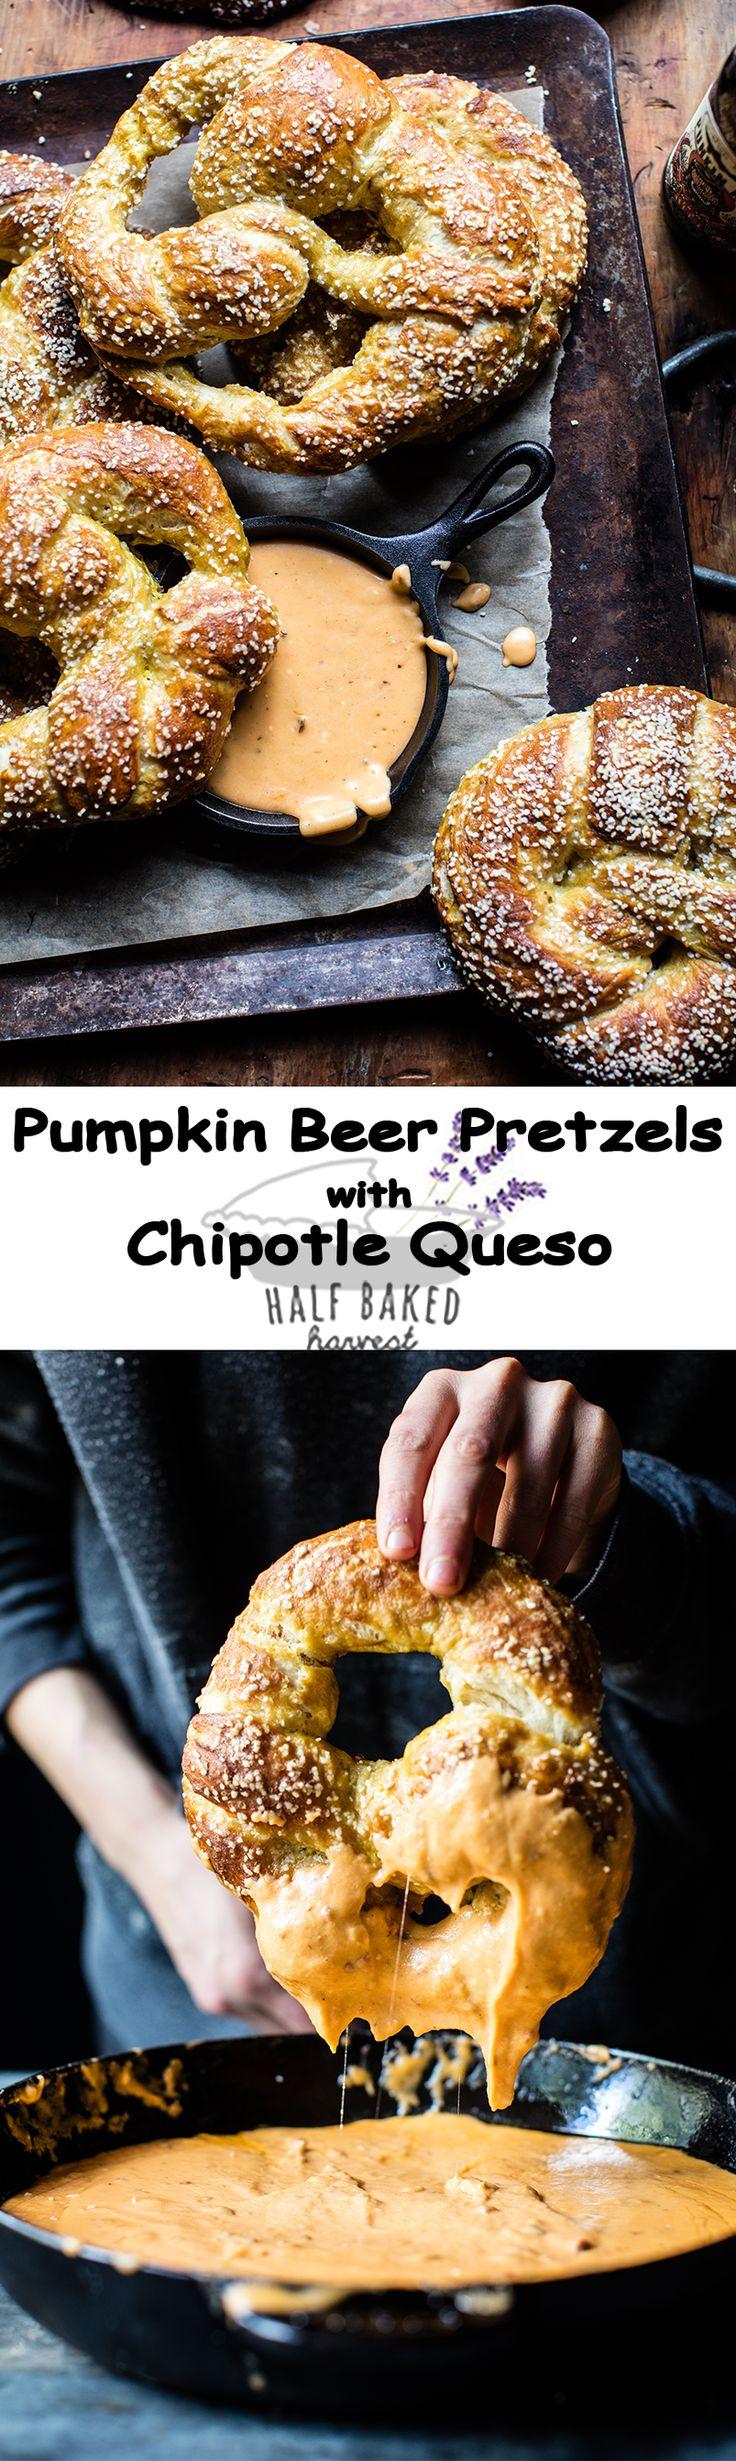 Pumpkin Beer Pretzels with Chipotle Queso | halfbakedharvest.com @hbharvest